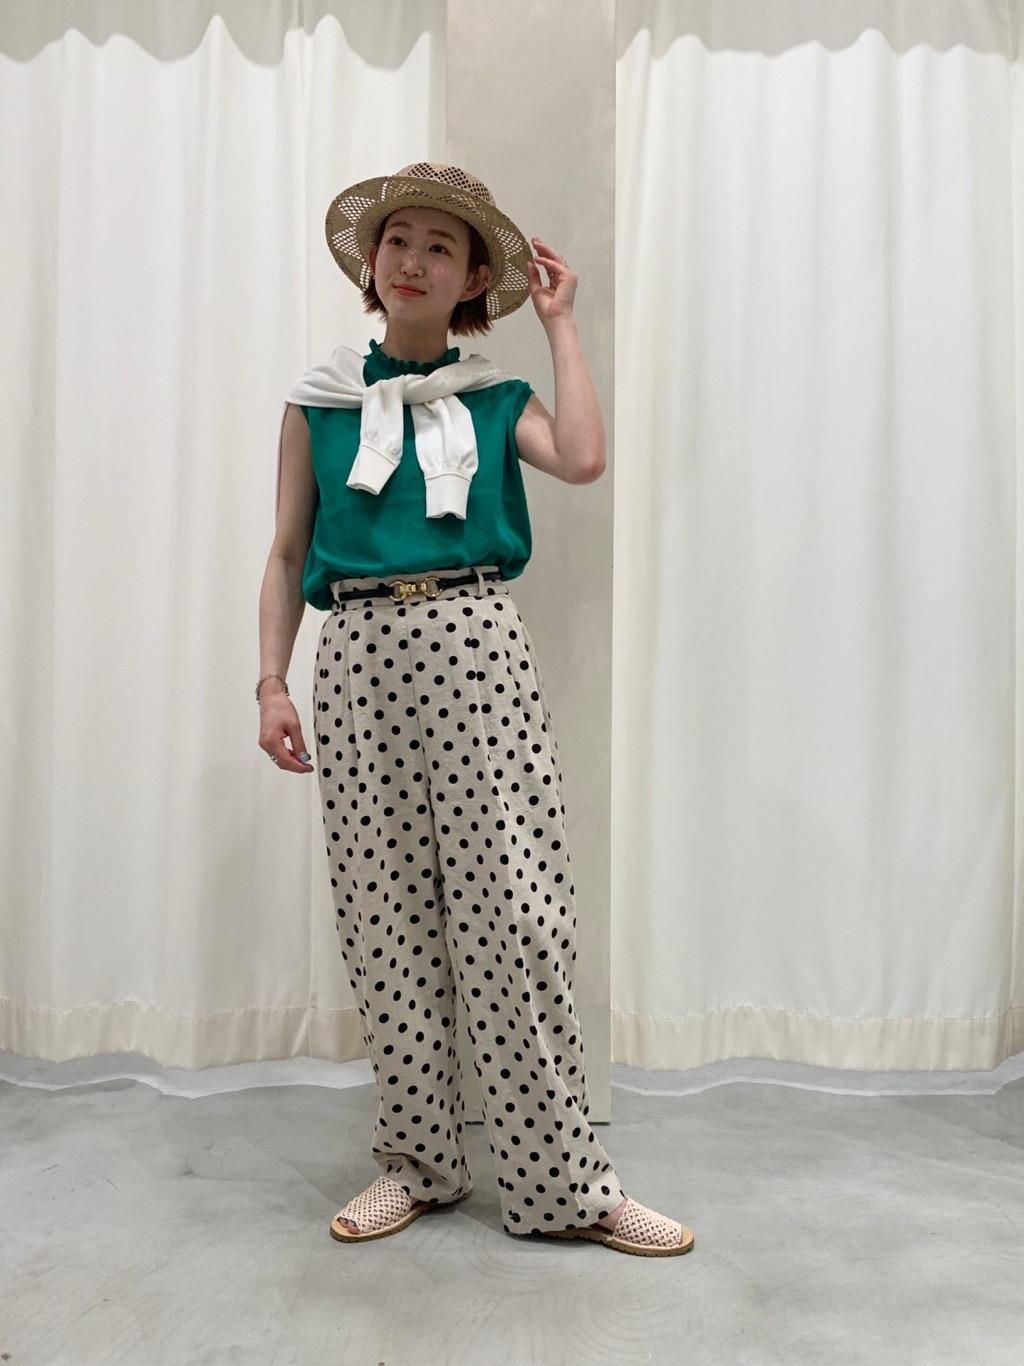 - CHILD WOMAN CHILD WOMAN , PAR ICI 東京スカイツリータウン・ソラマチ 身長:150cm 2021.05.19